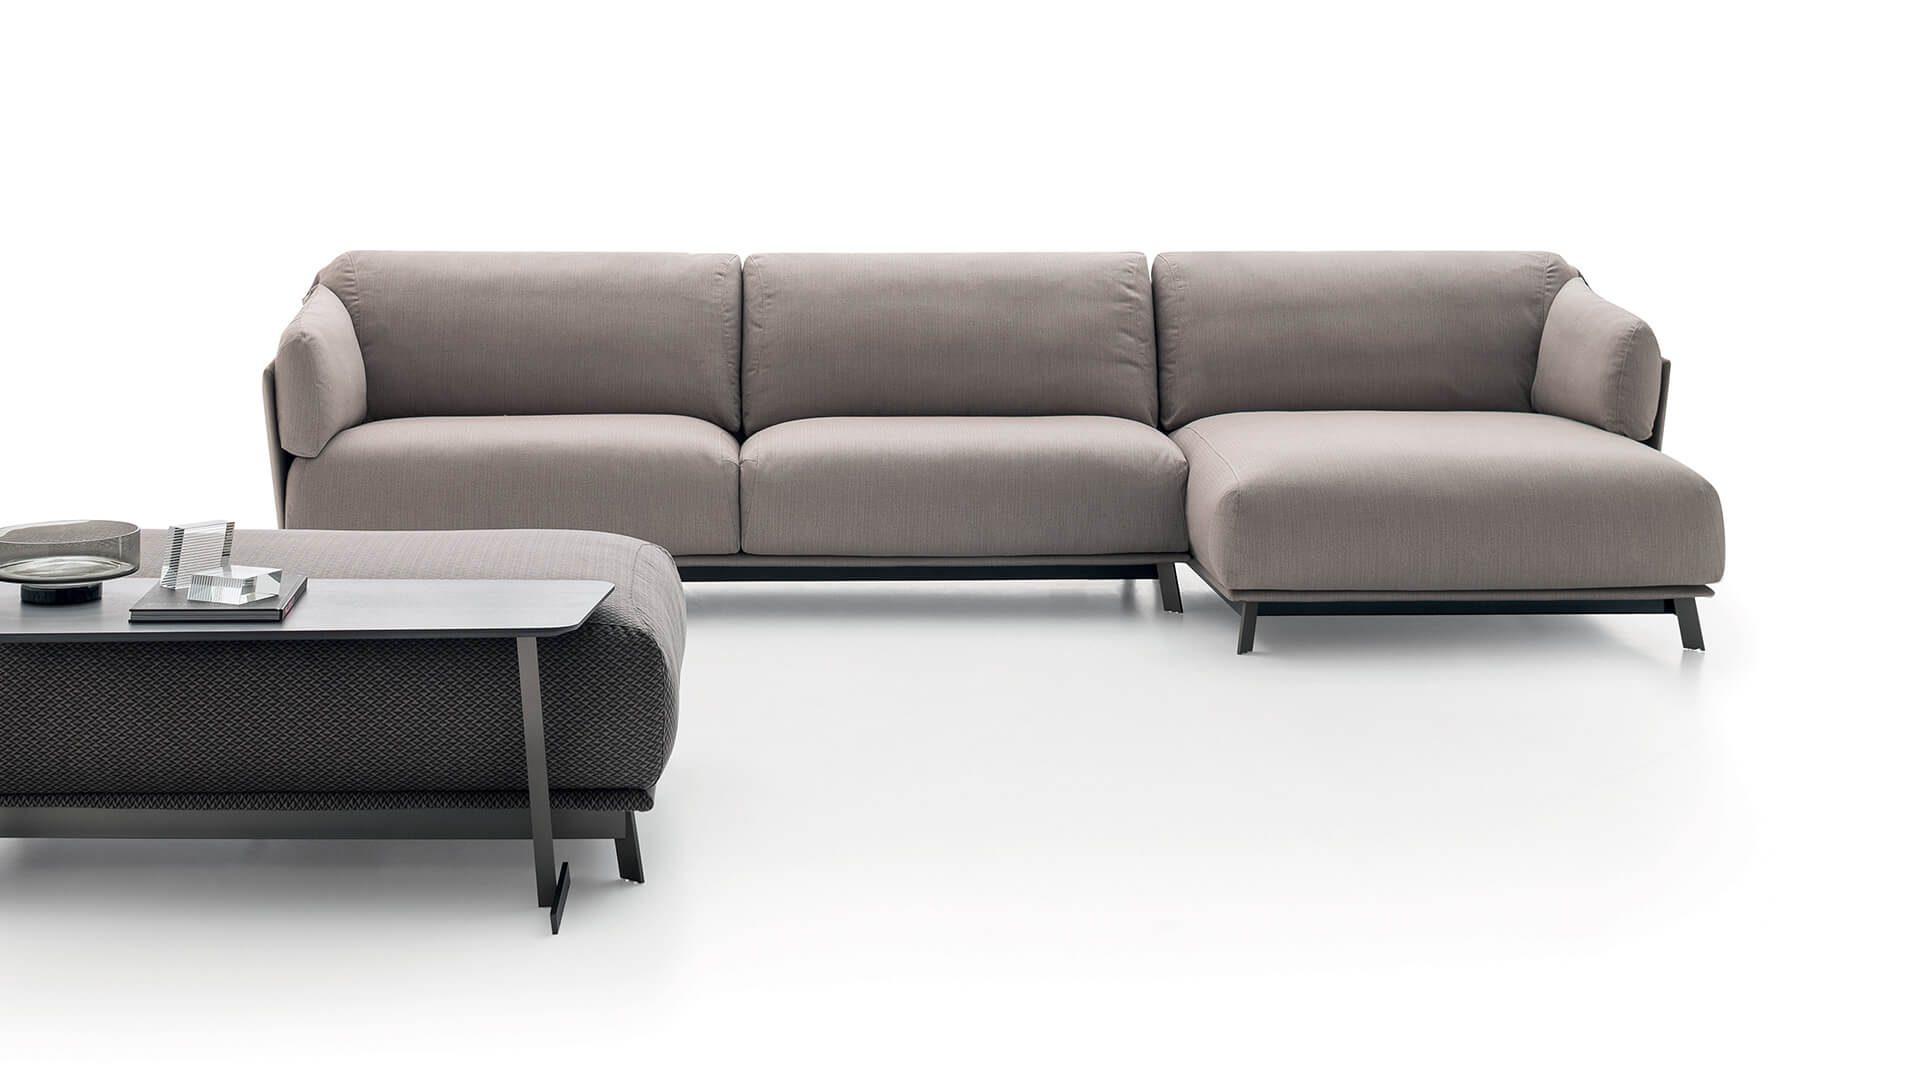 Italian Leather Sofas, Beds and Armchair - Ditre Italia